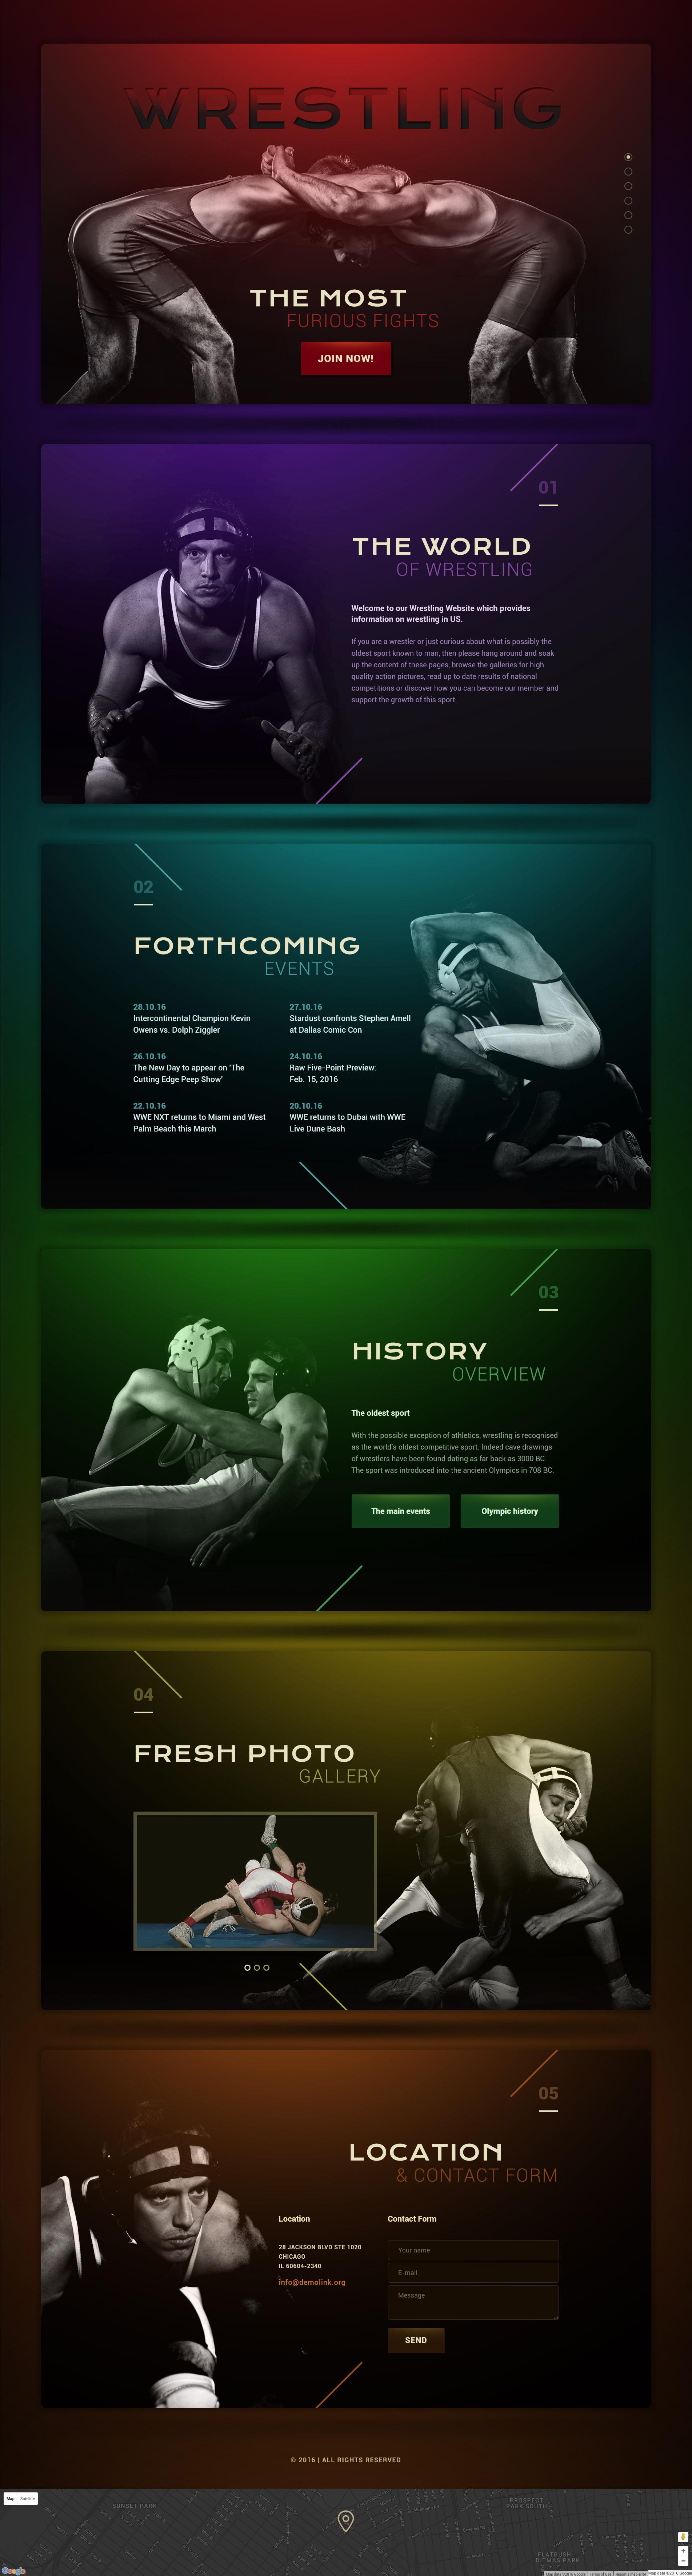 Responsywny szablon Landing Page #58521 na temat: wrestling - zrzut ekranu